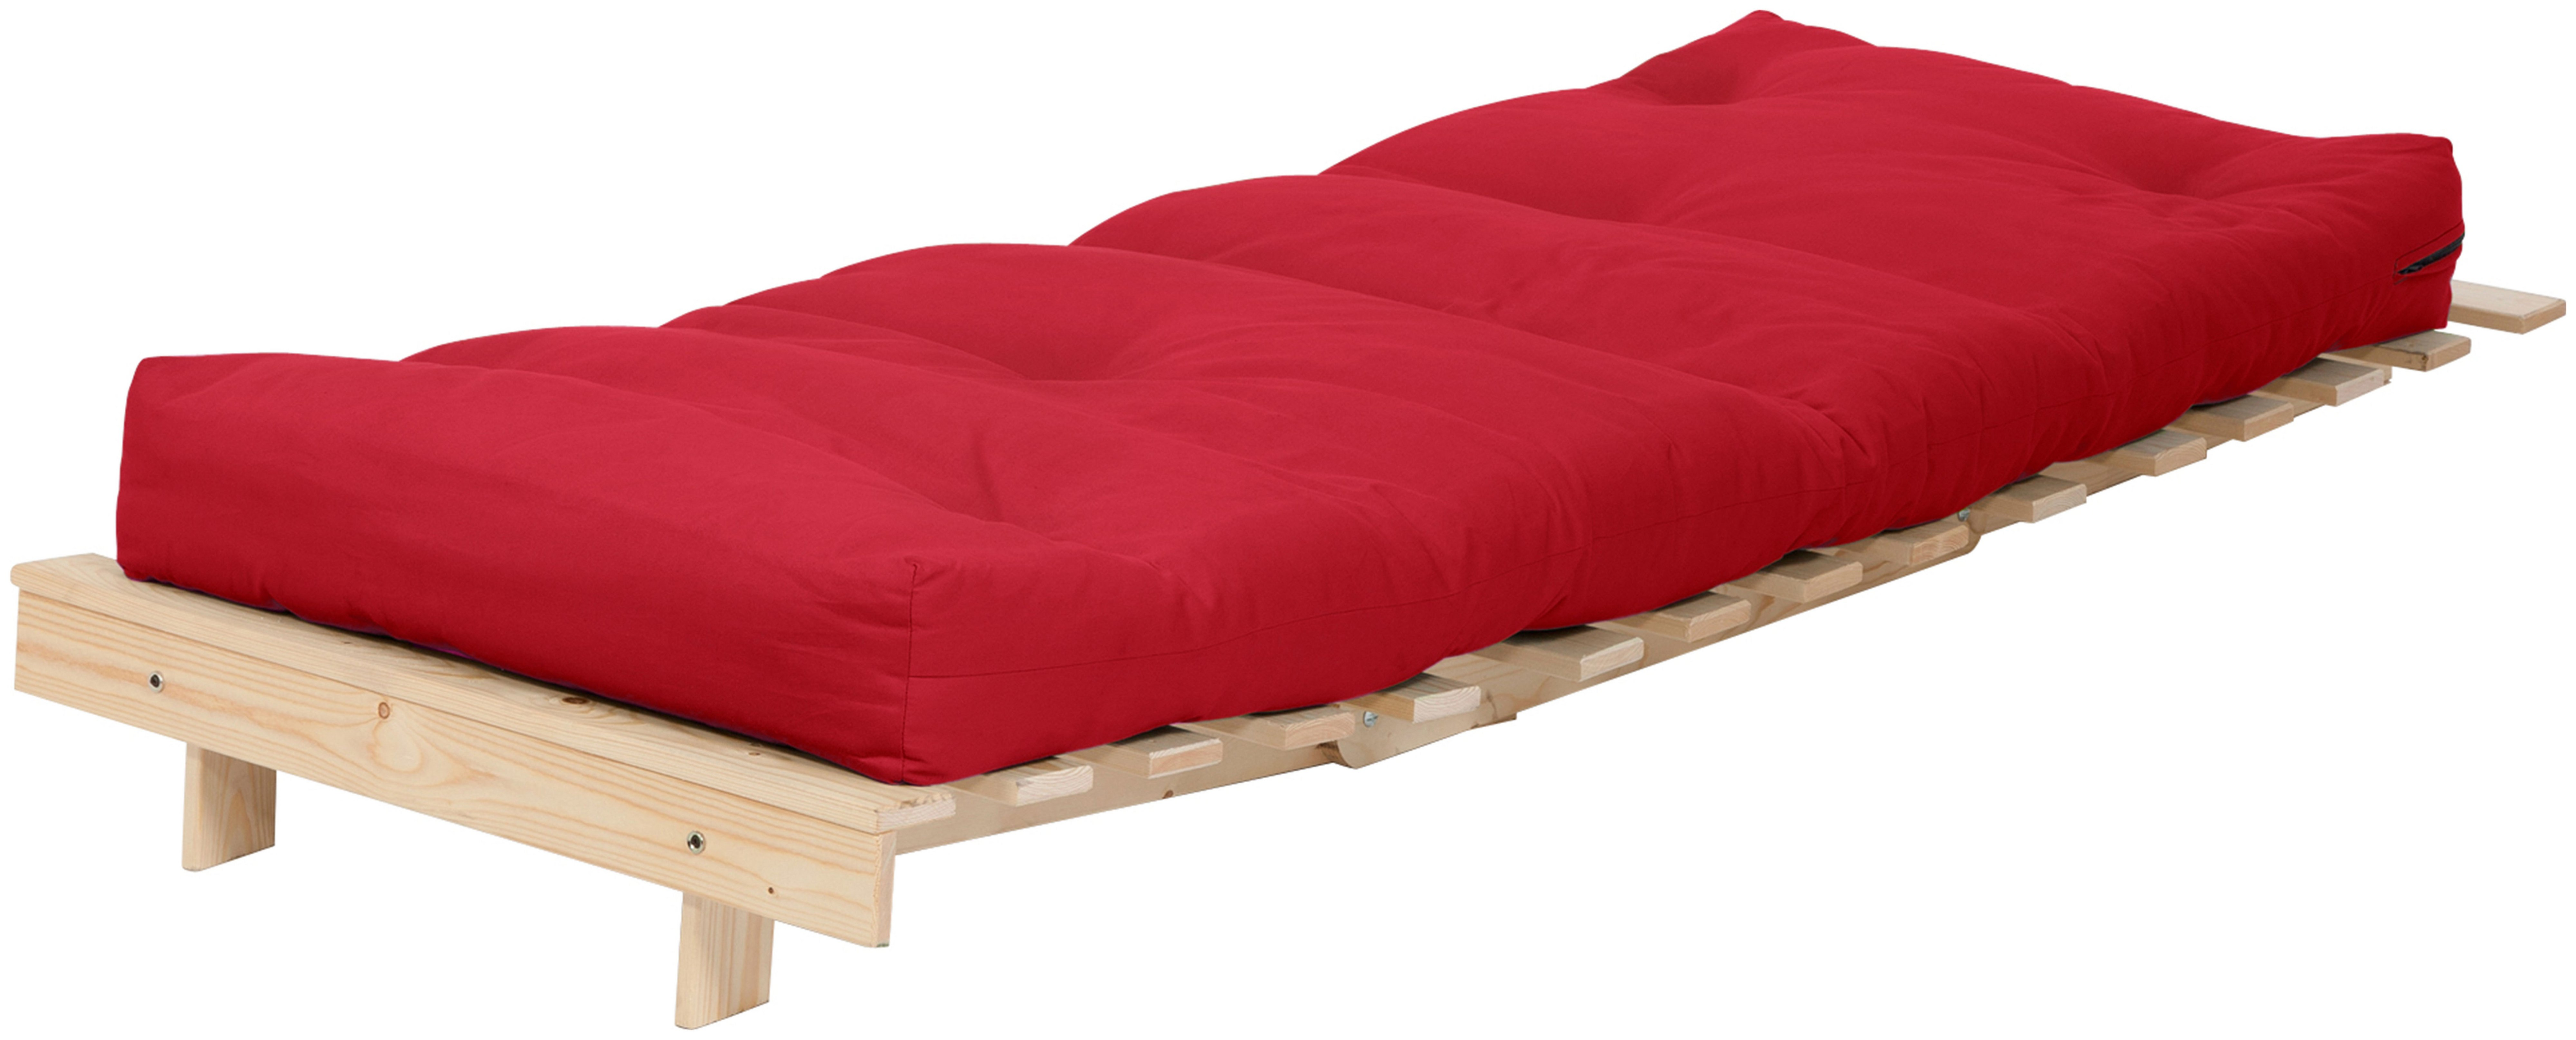 Habitat Single Futon Sofa Bed with Mattress - Red